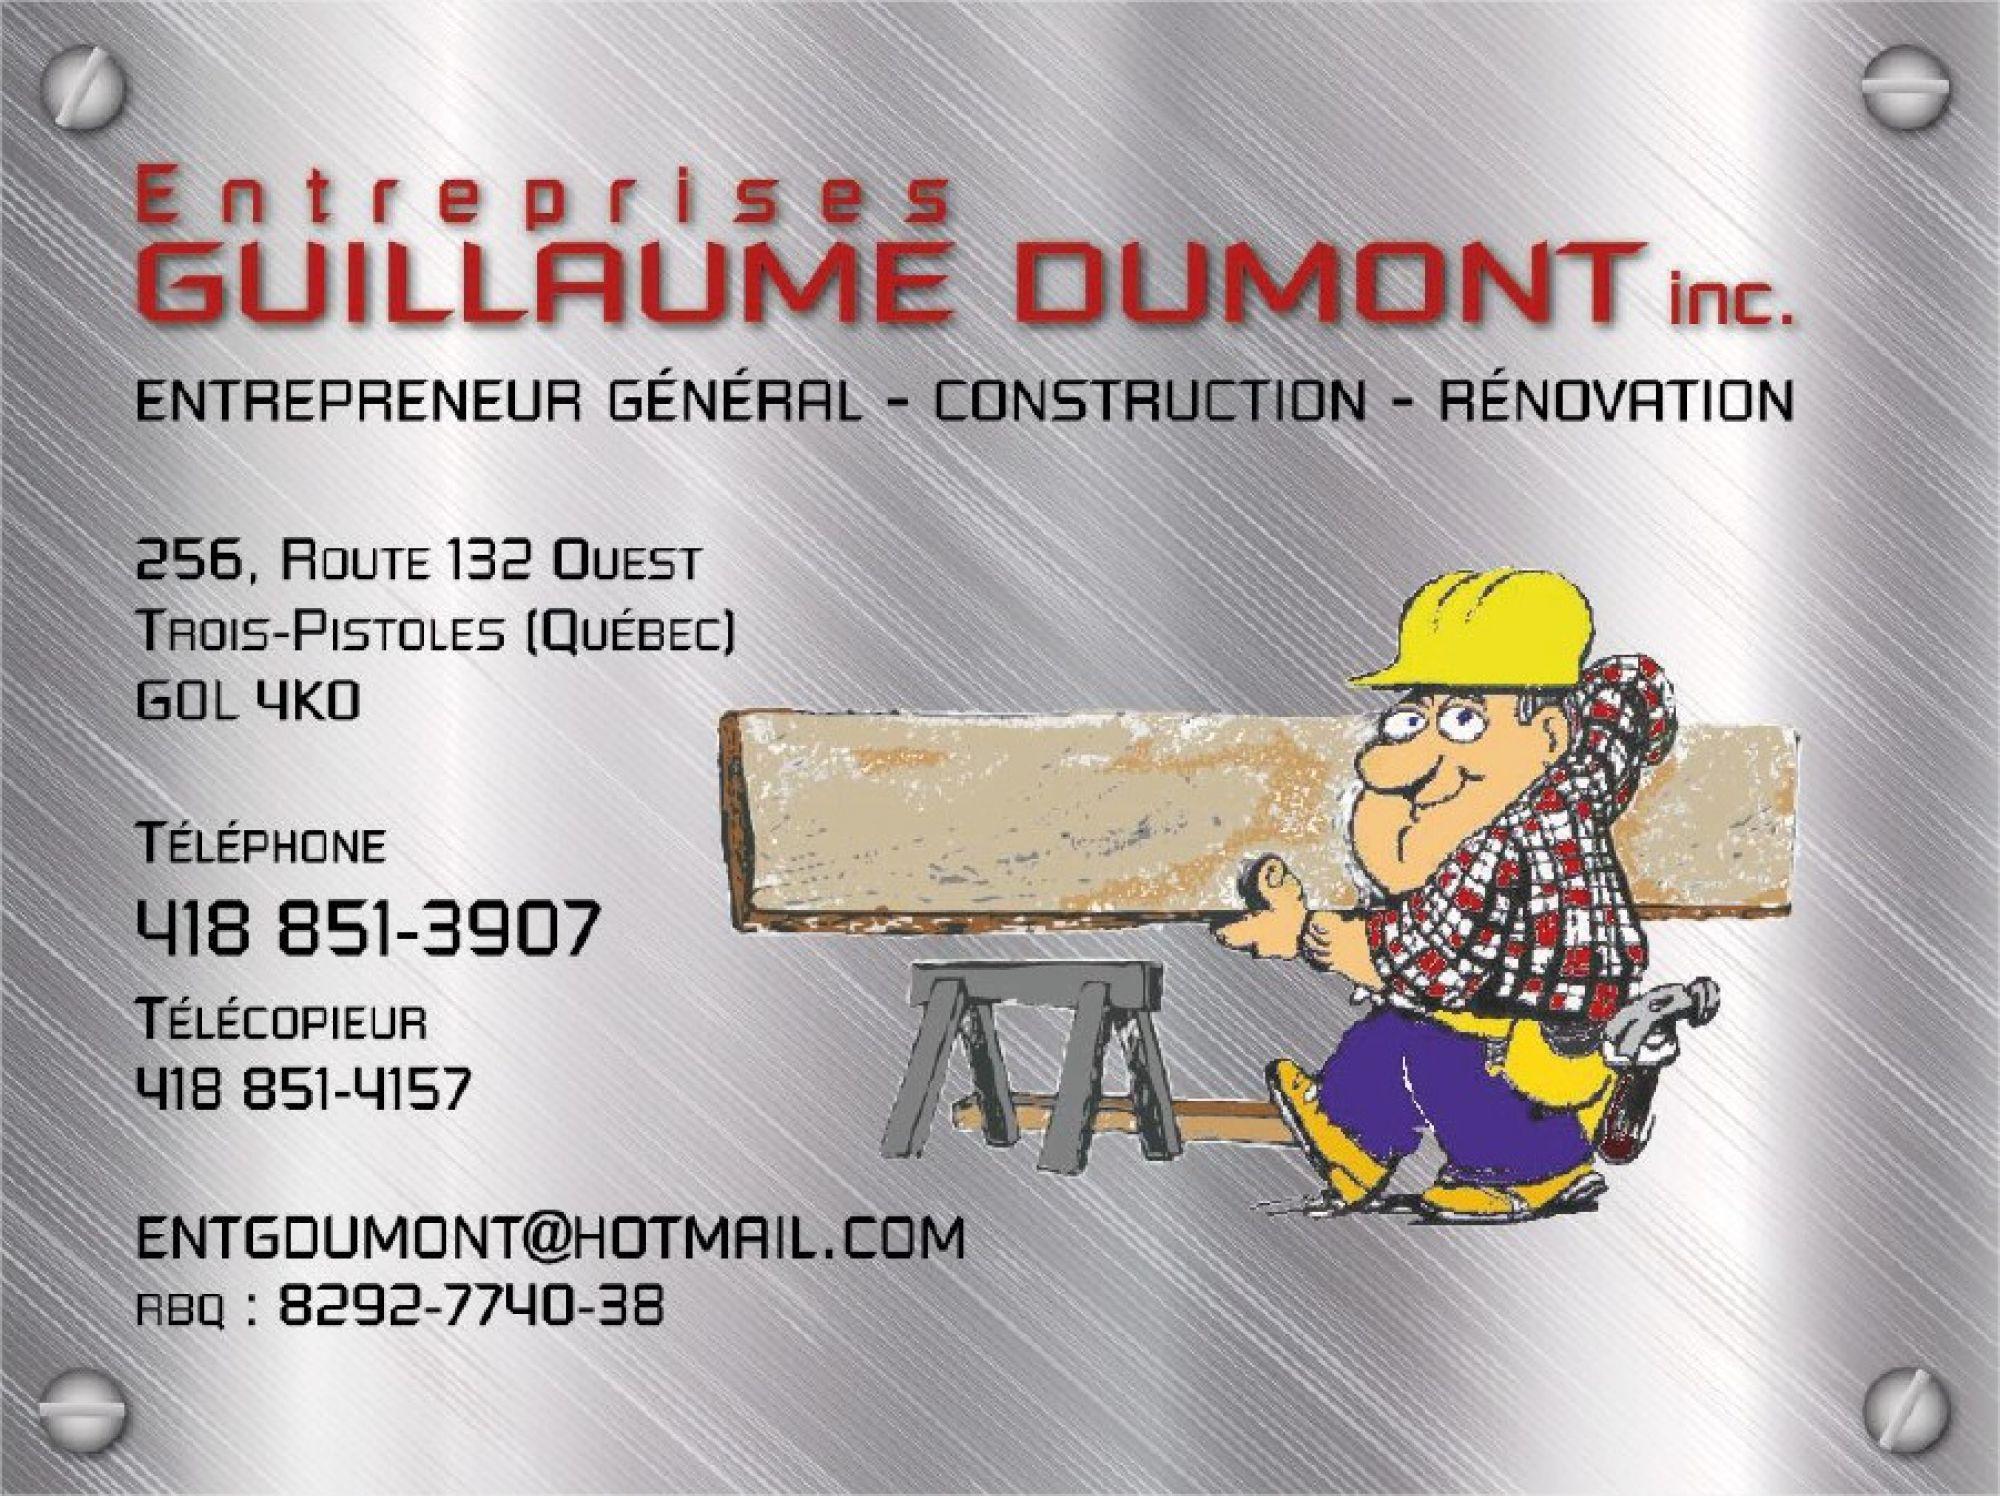 ConstructionGDumont